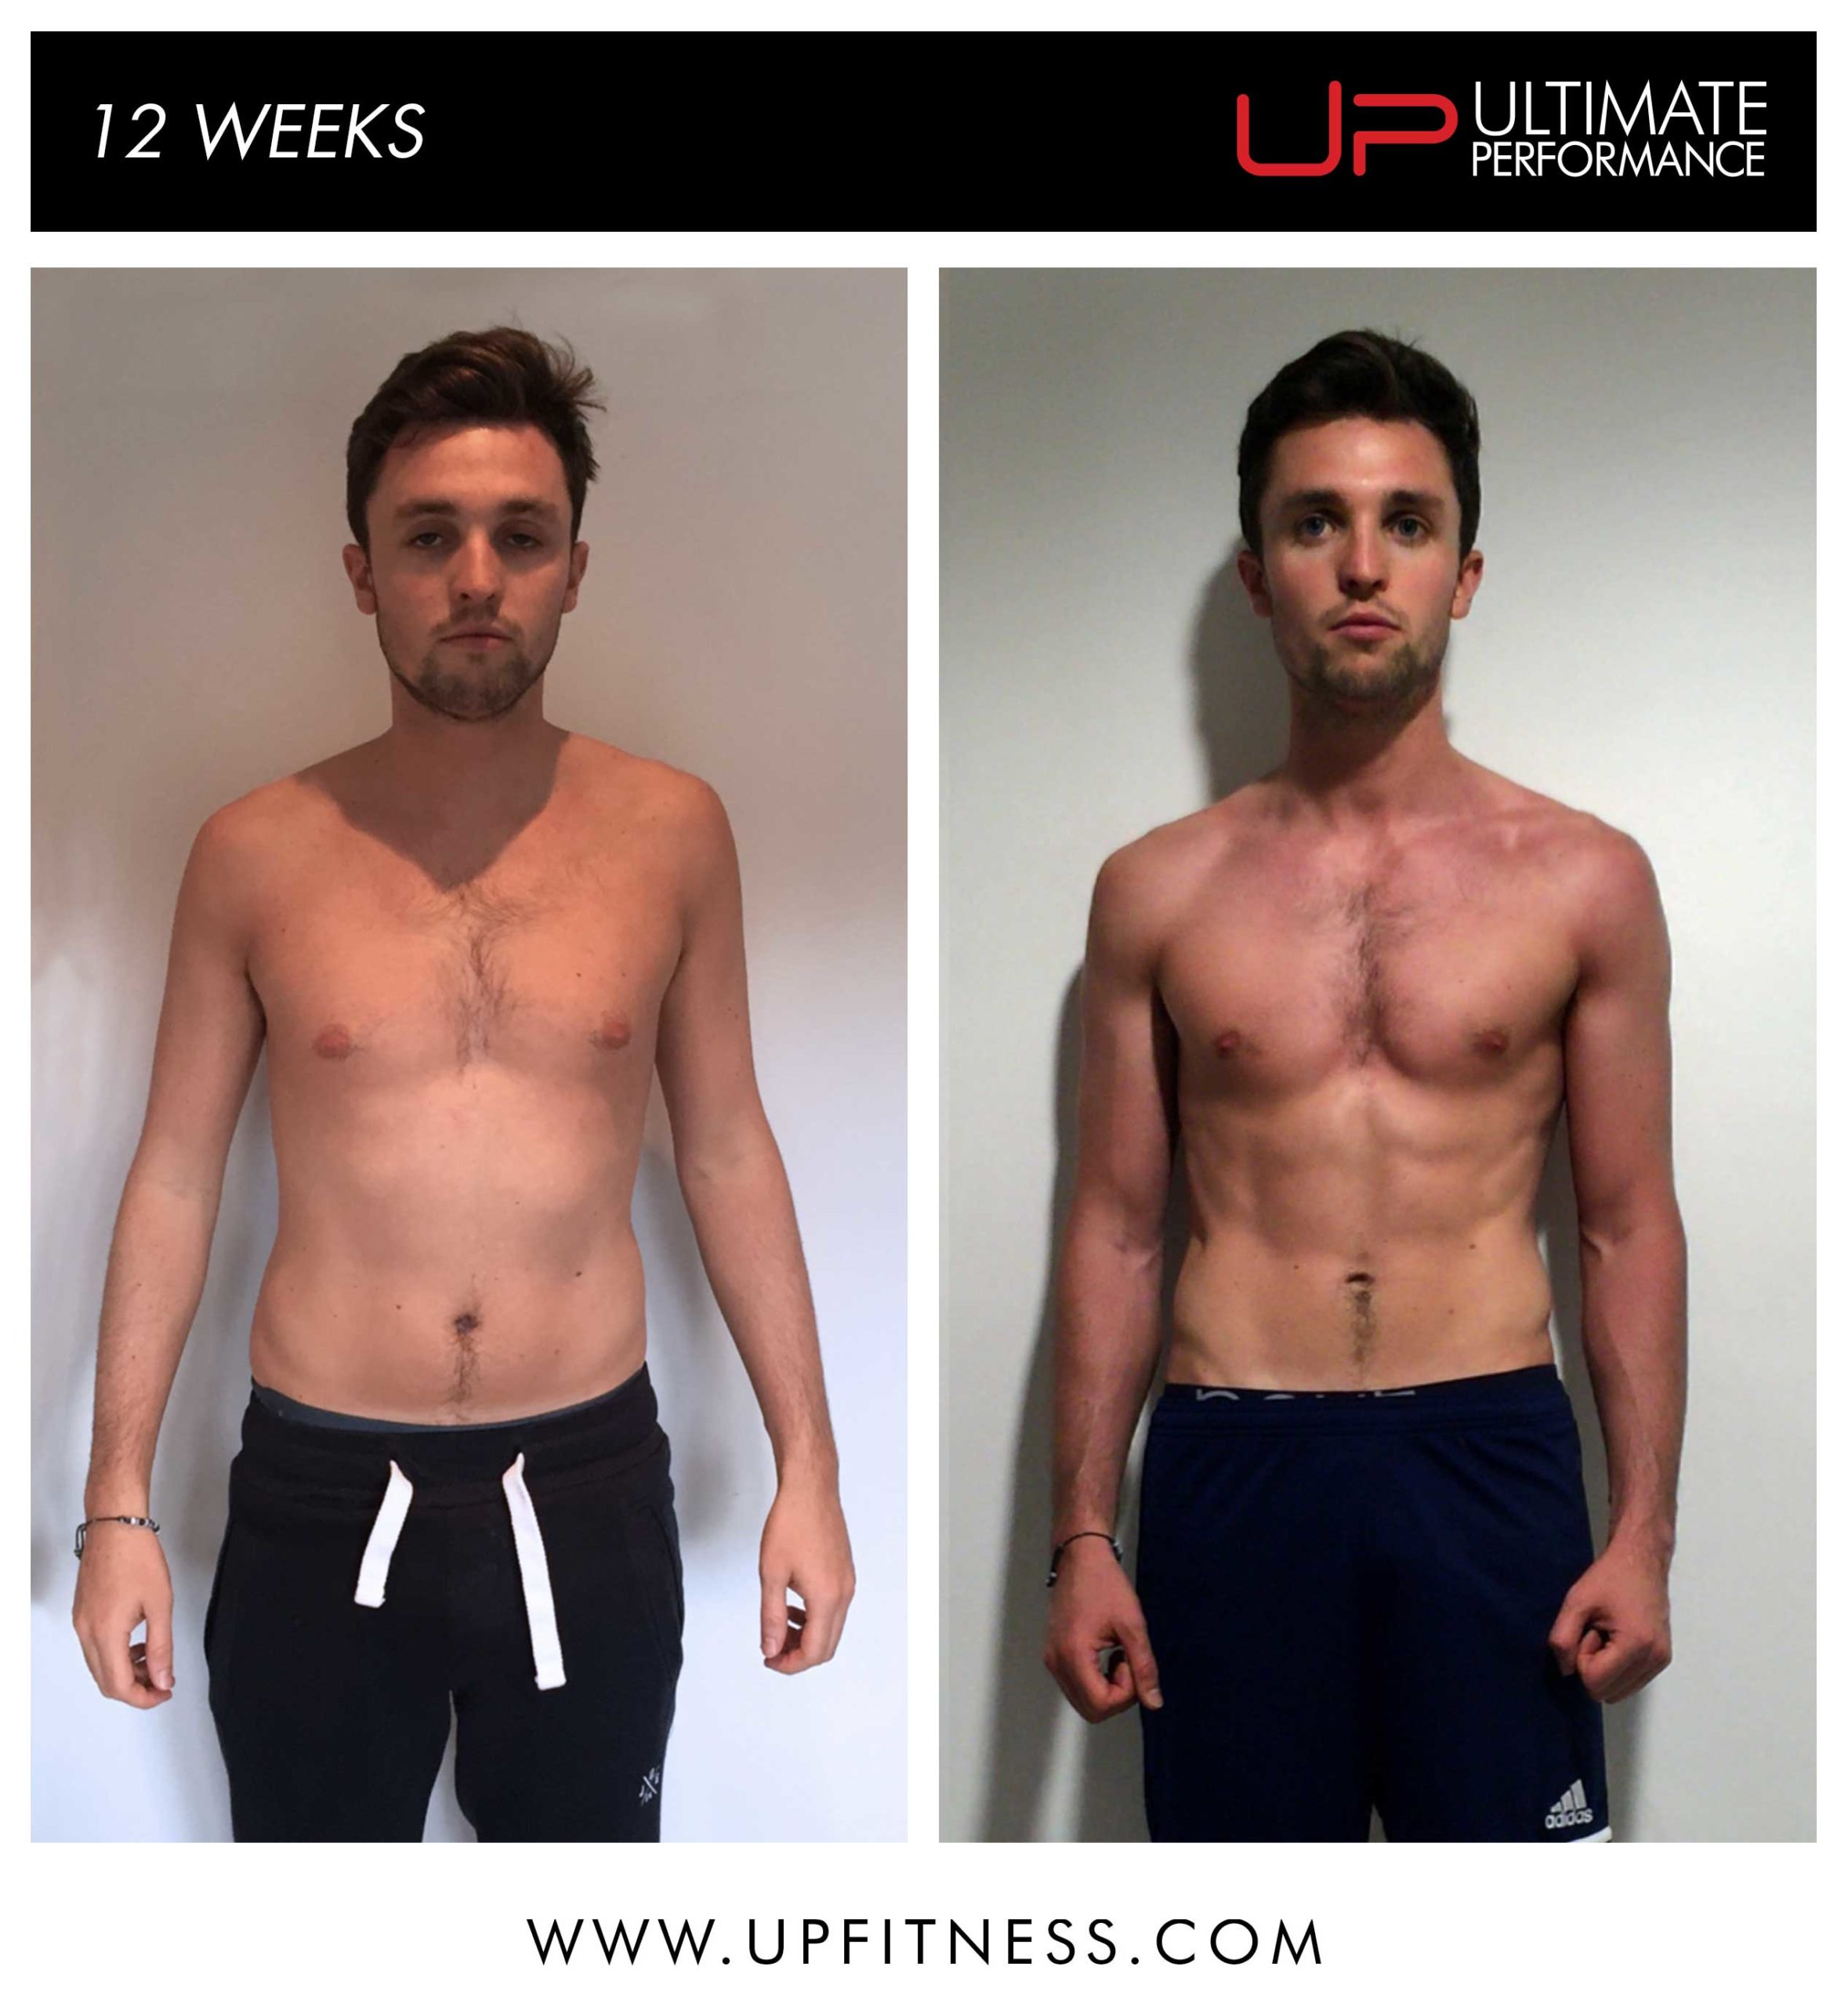 Fabian 12 week transformation